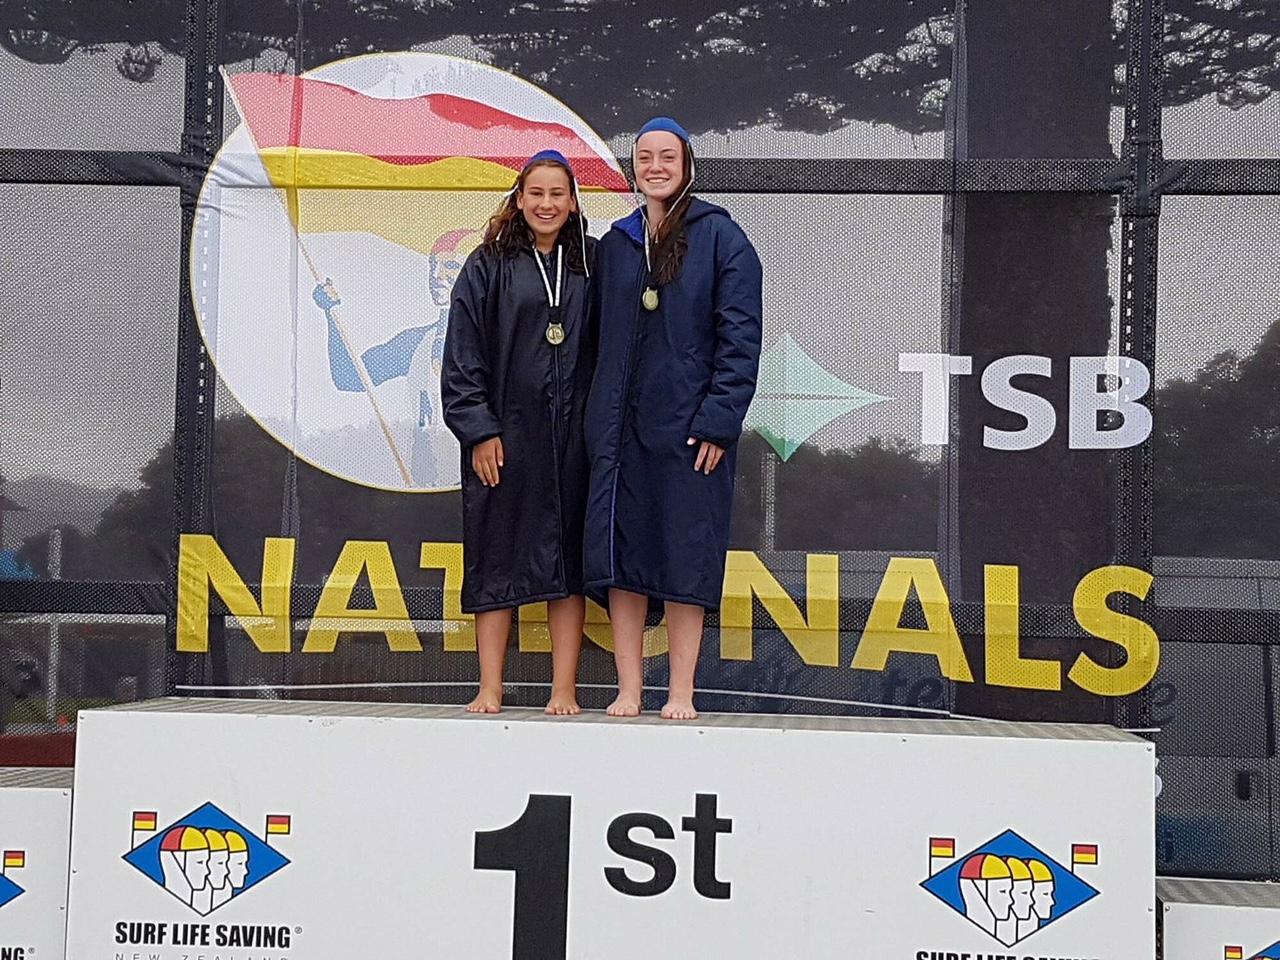 NZ Surf Lifesaving Champions 2